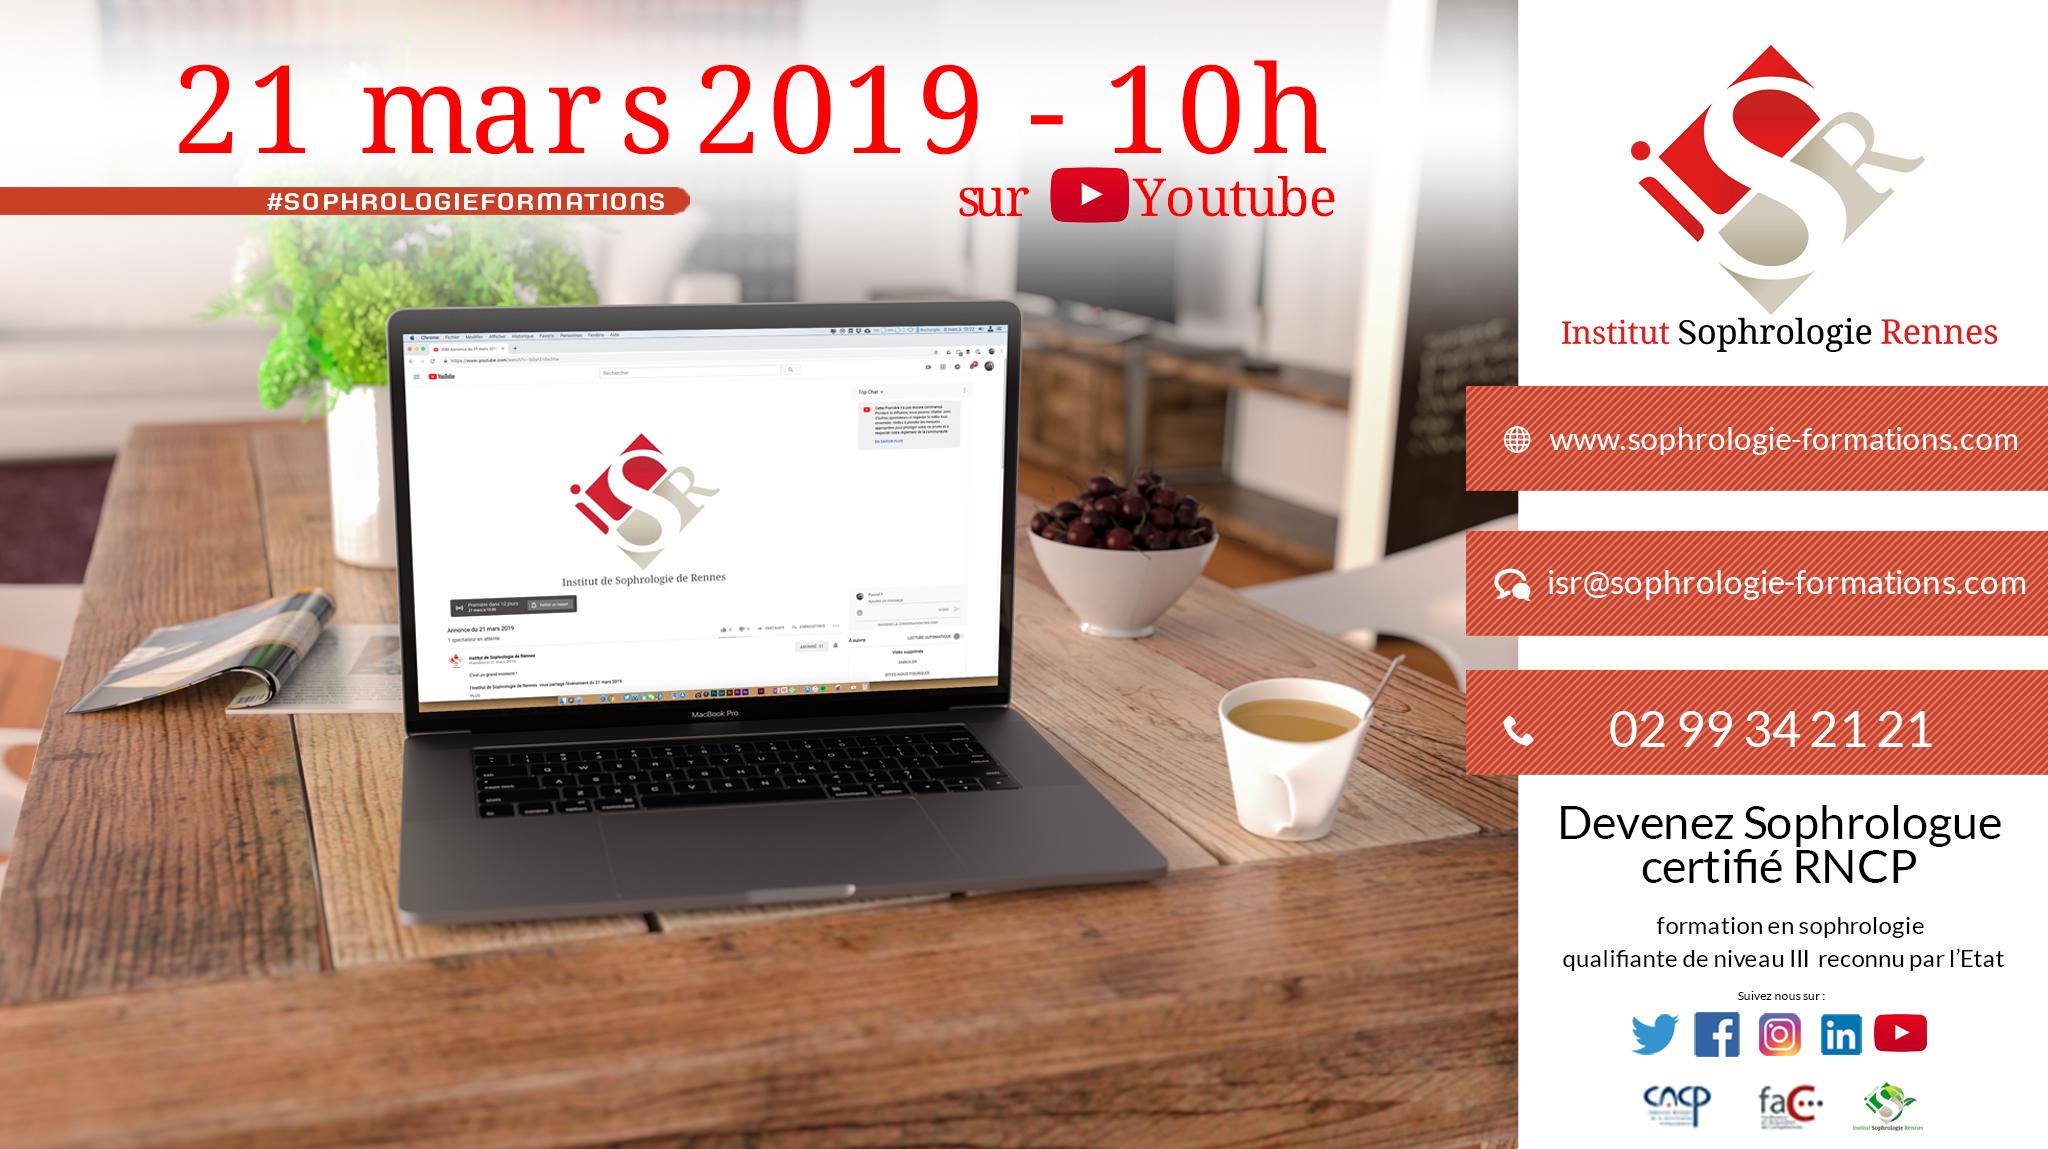 21 mars 2019 Youtube